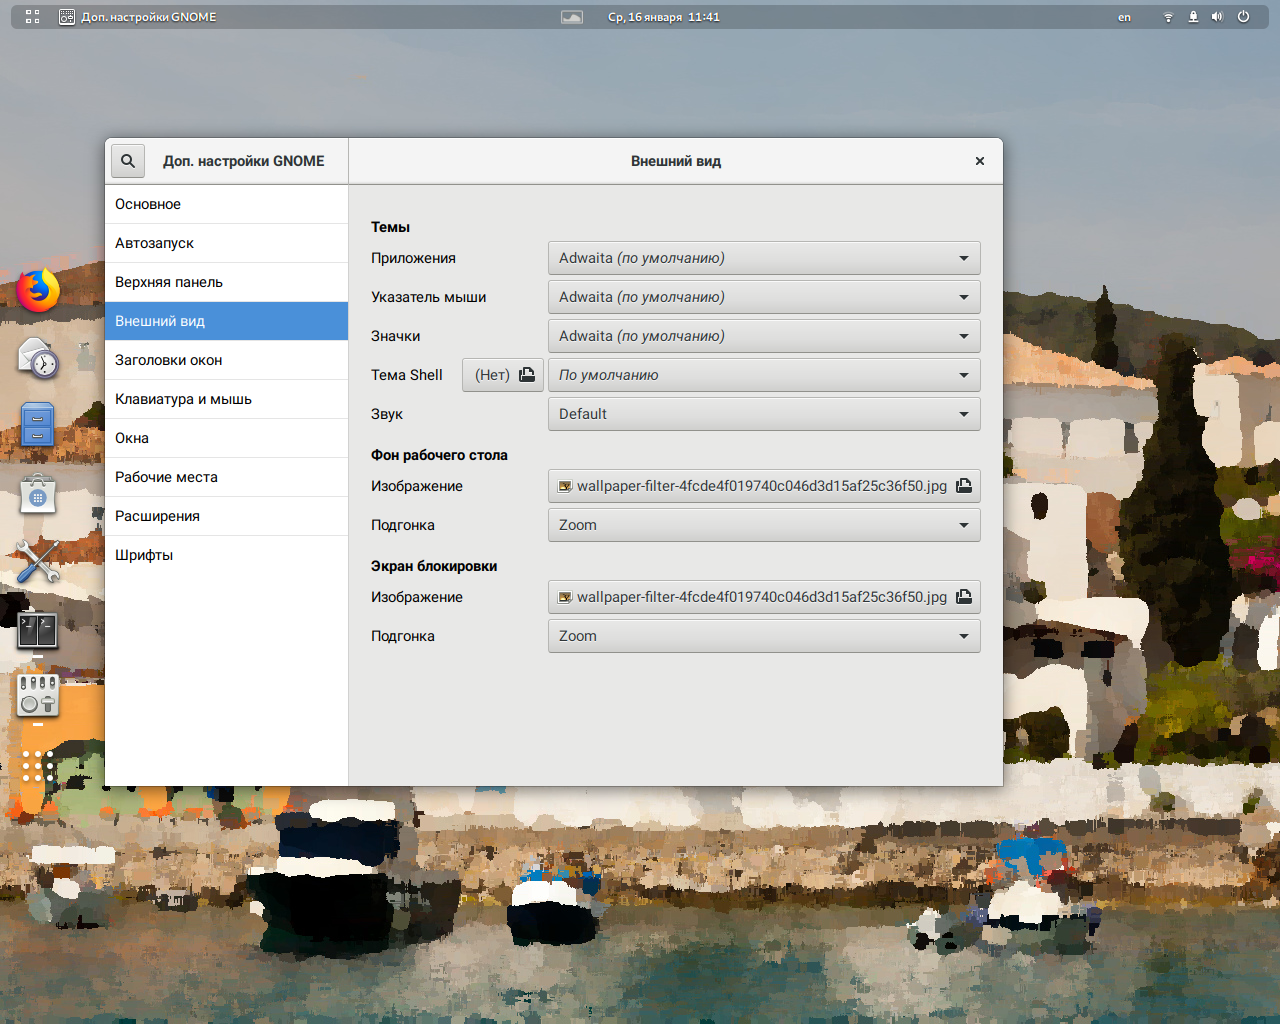 Not working on Fedora release 29 (Twenty Nine) · Issue #60